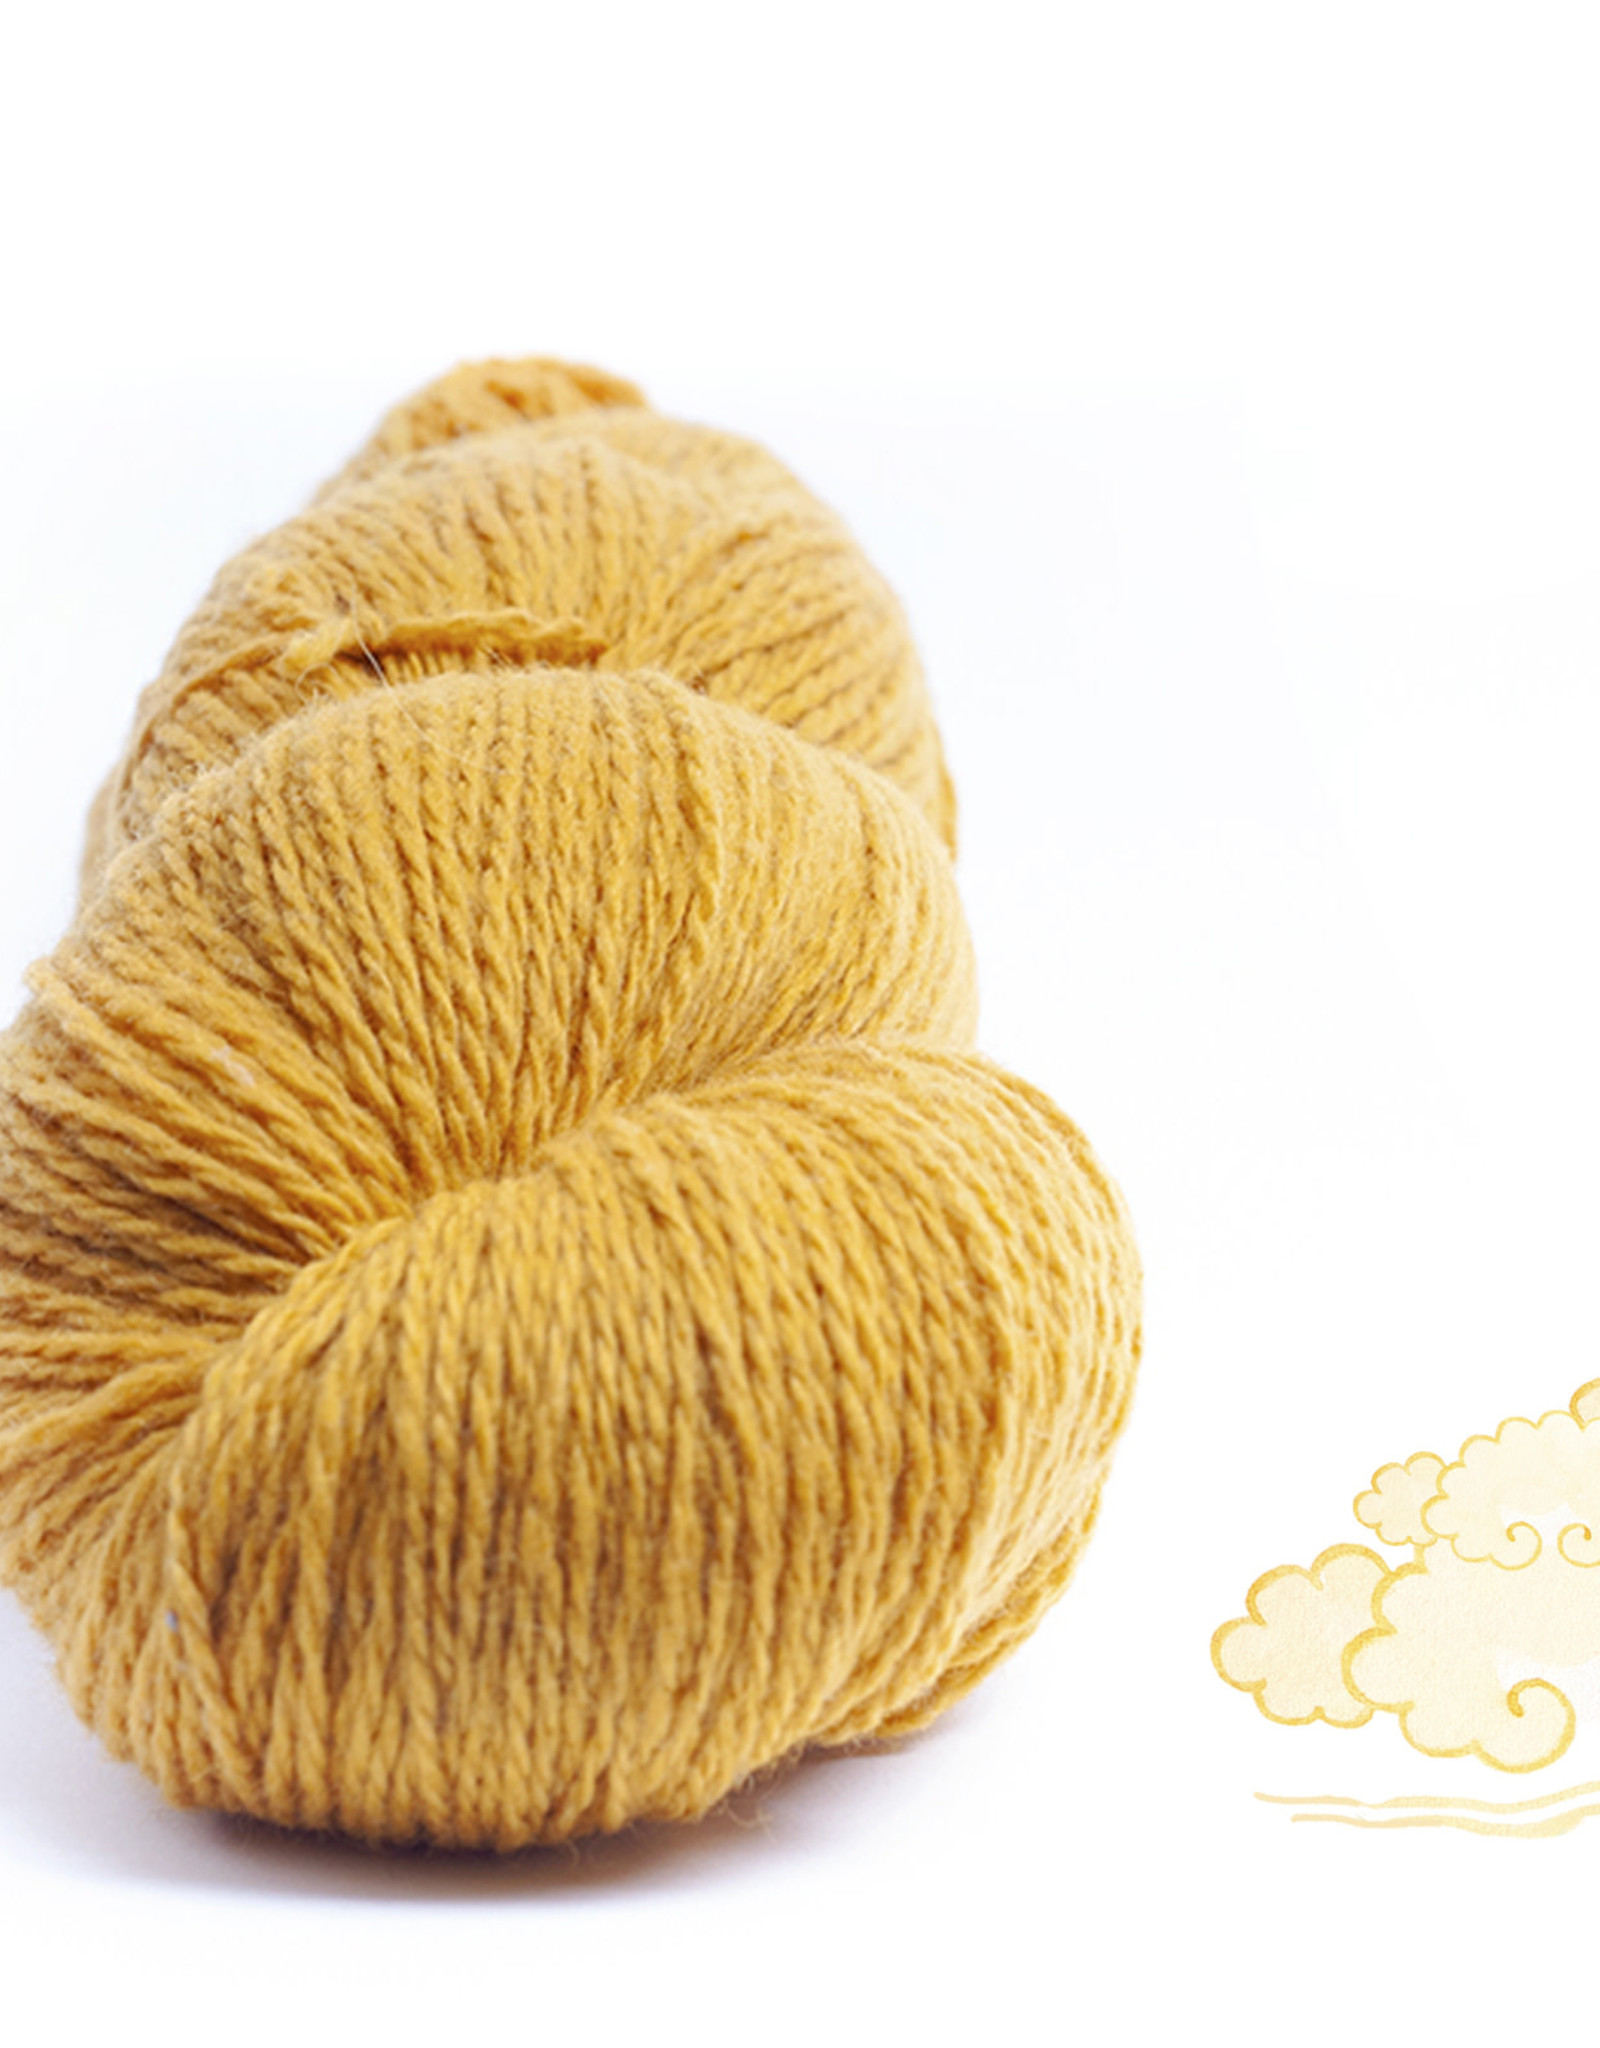 mYak MYak Tibetan Cloud Wool